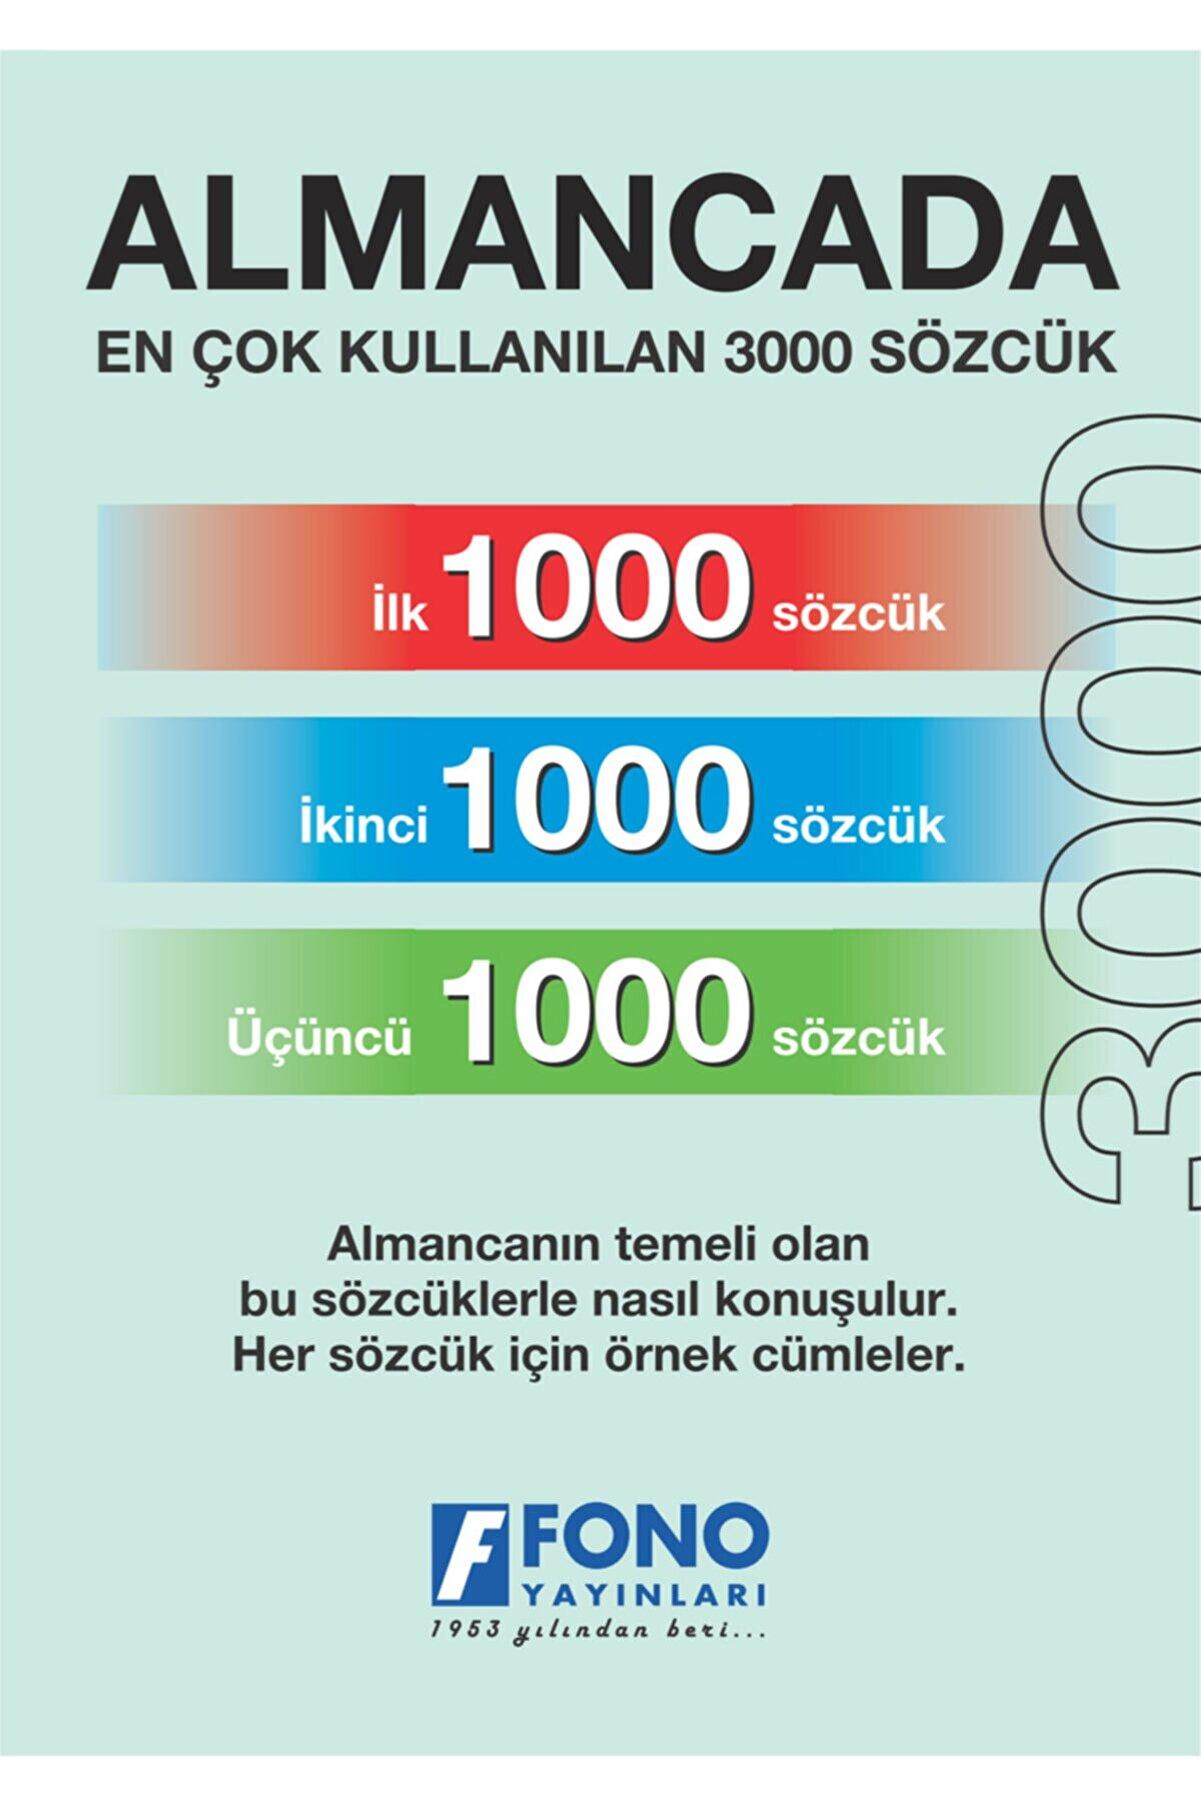 Fono Yayınları Almanca Ilk 3000 Sözcük